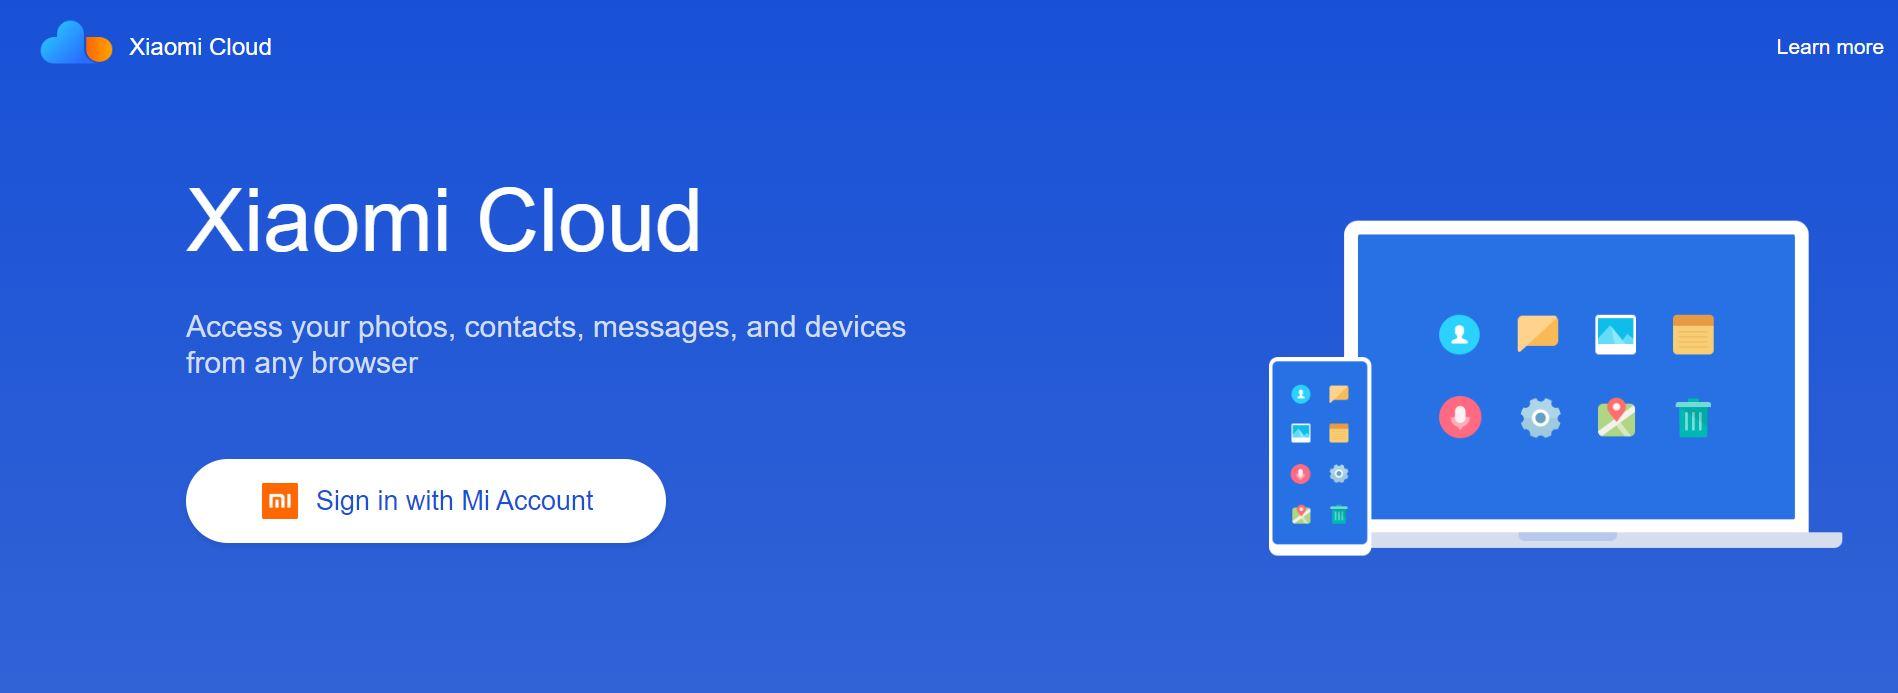 Xiaomi regala 50GB gratuiti su Xiaomi Cloud per un anno